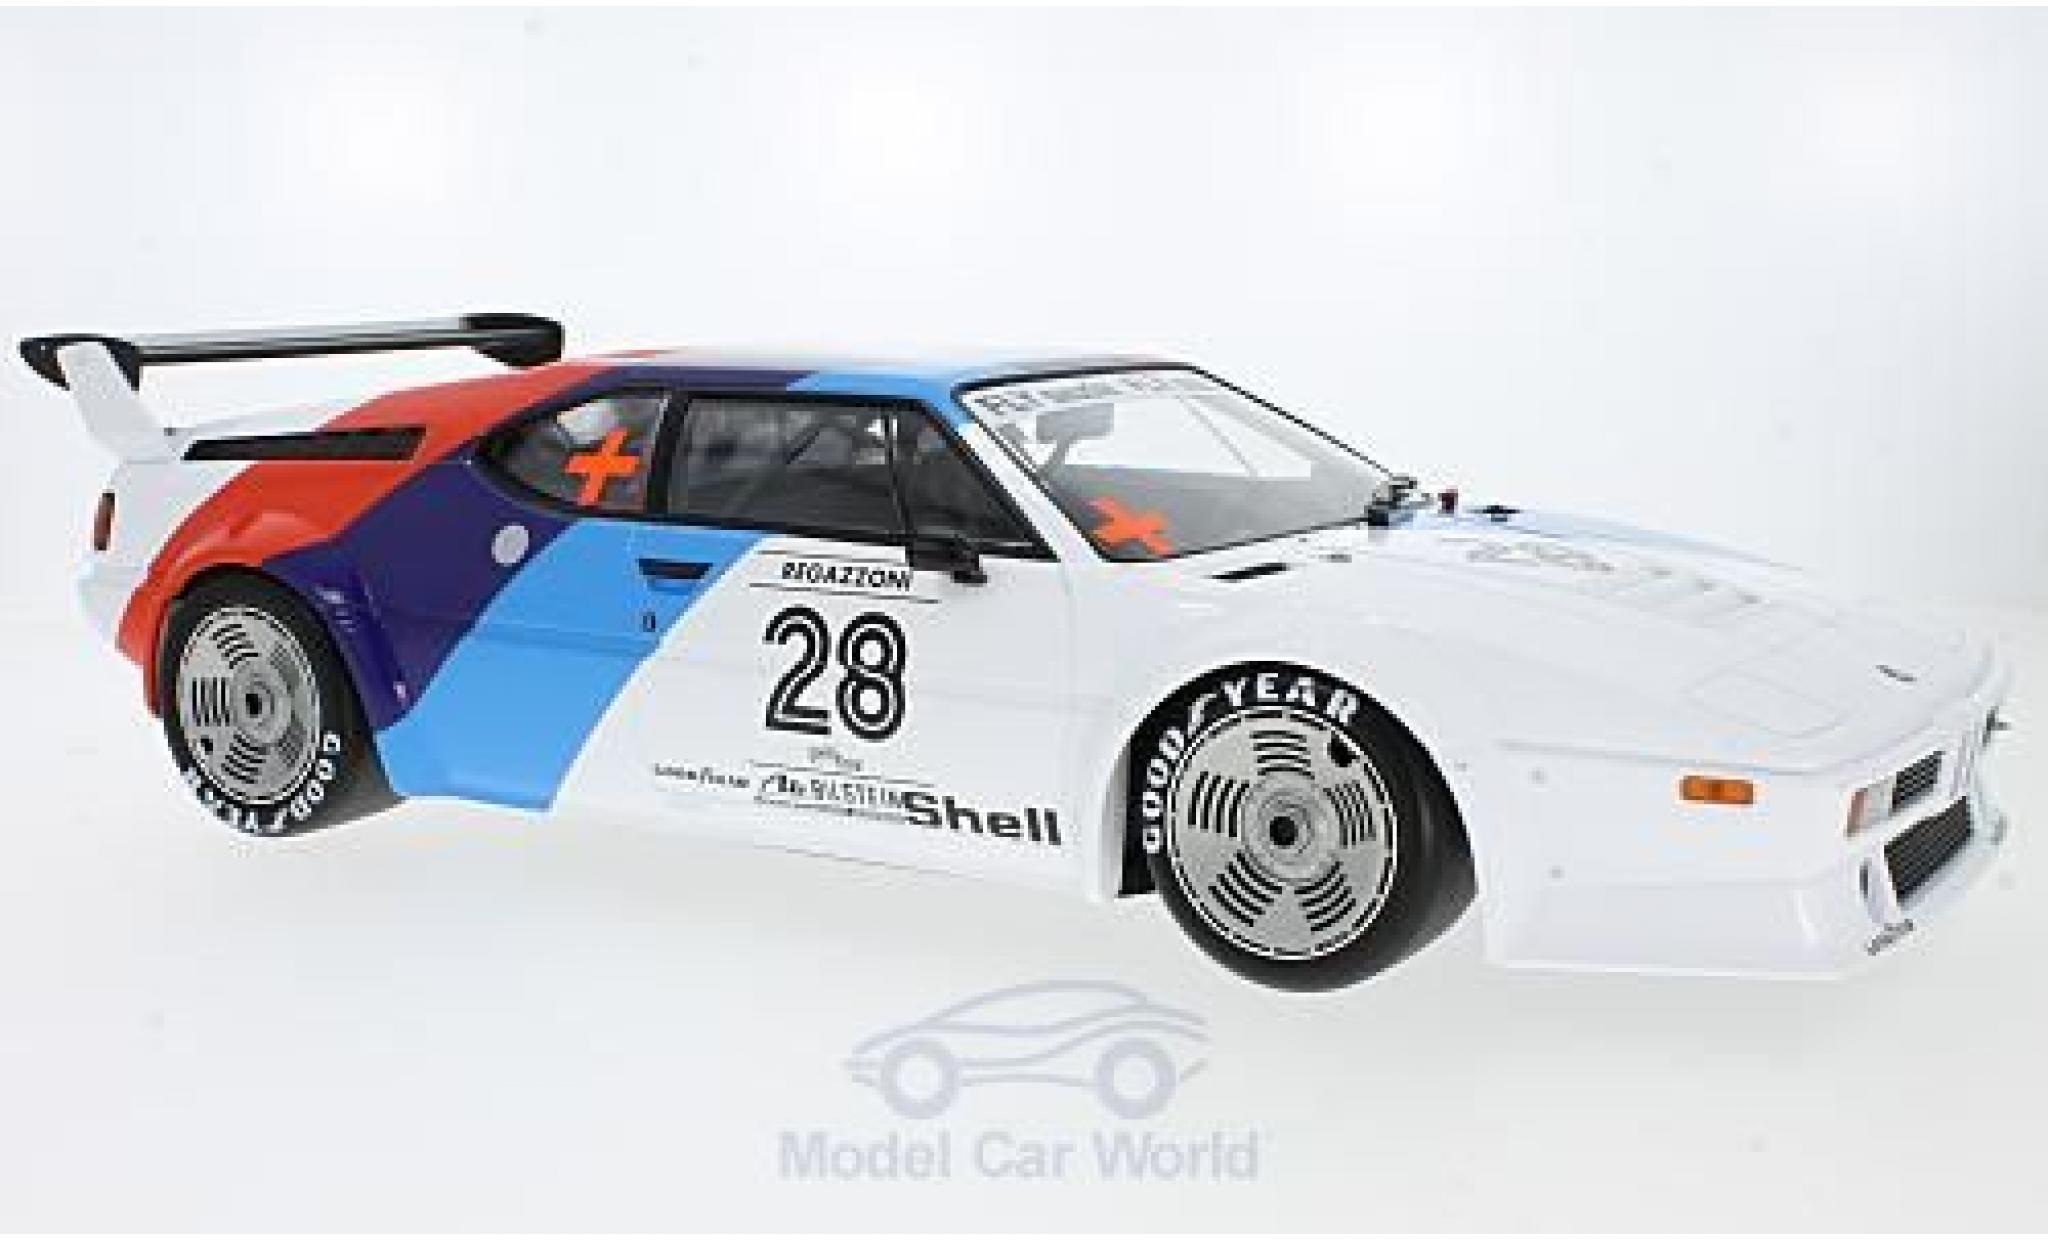 Bmw M1 1979 1/12 Minichamps BMW Procar No.28 BMW Motorsport Procar 1979 C.Regazzoni